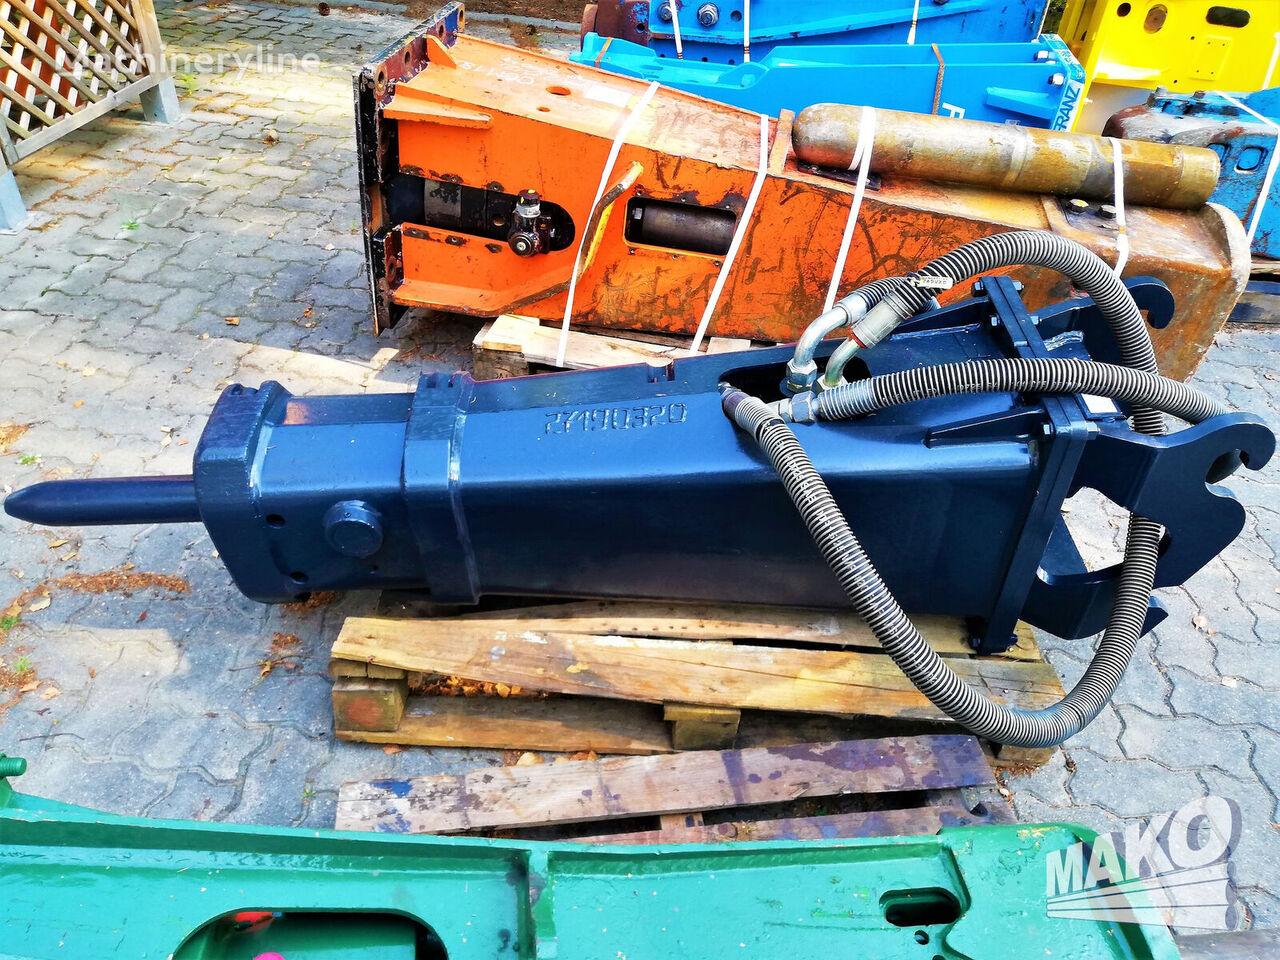 CATERPILLAR H 90 S hydraulic breaker